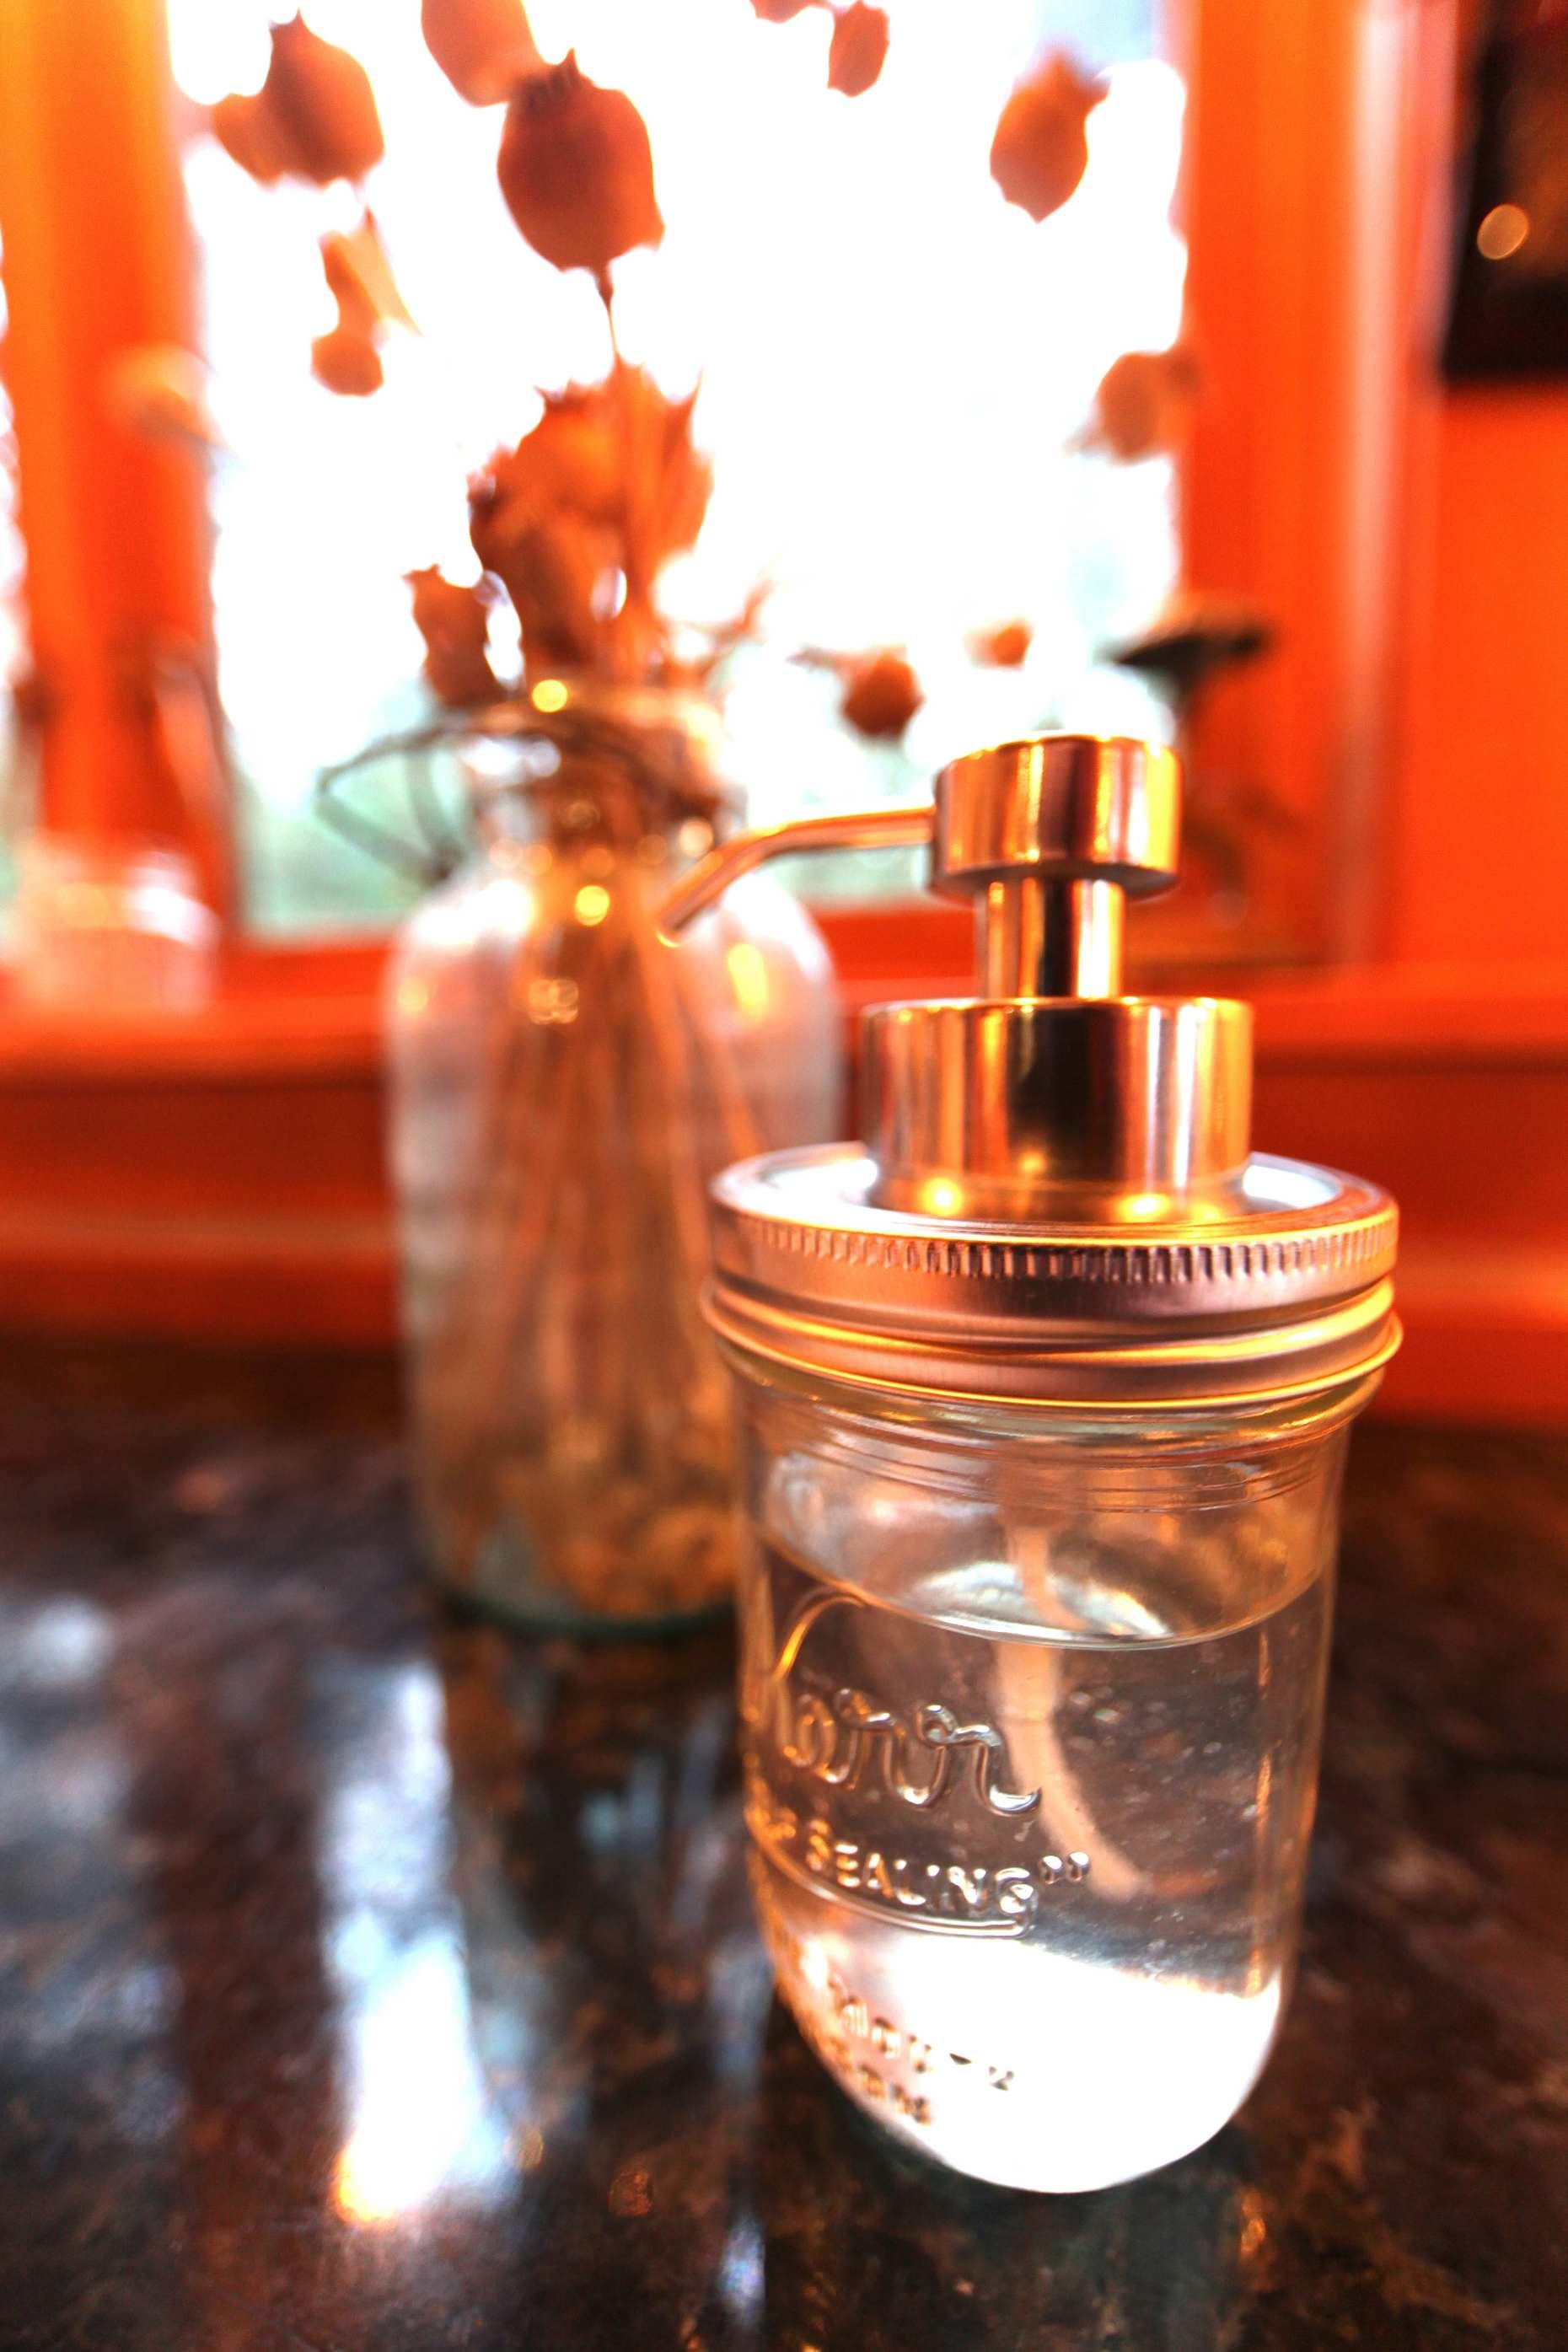 DIY Soap Dispenser, Ready For Use. Photo © Liesl Clark